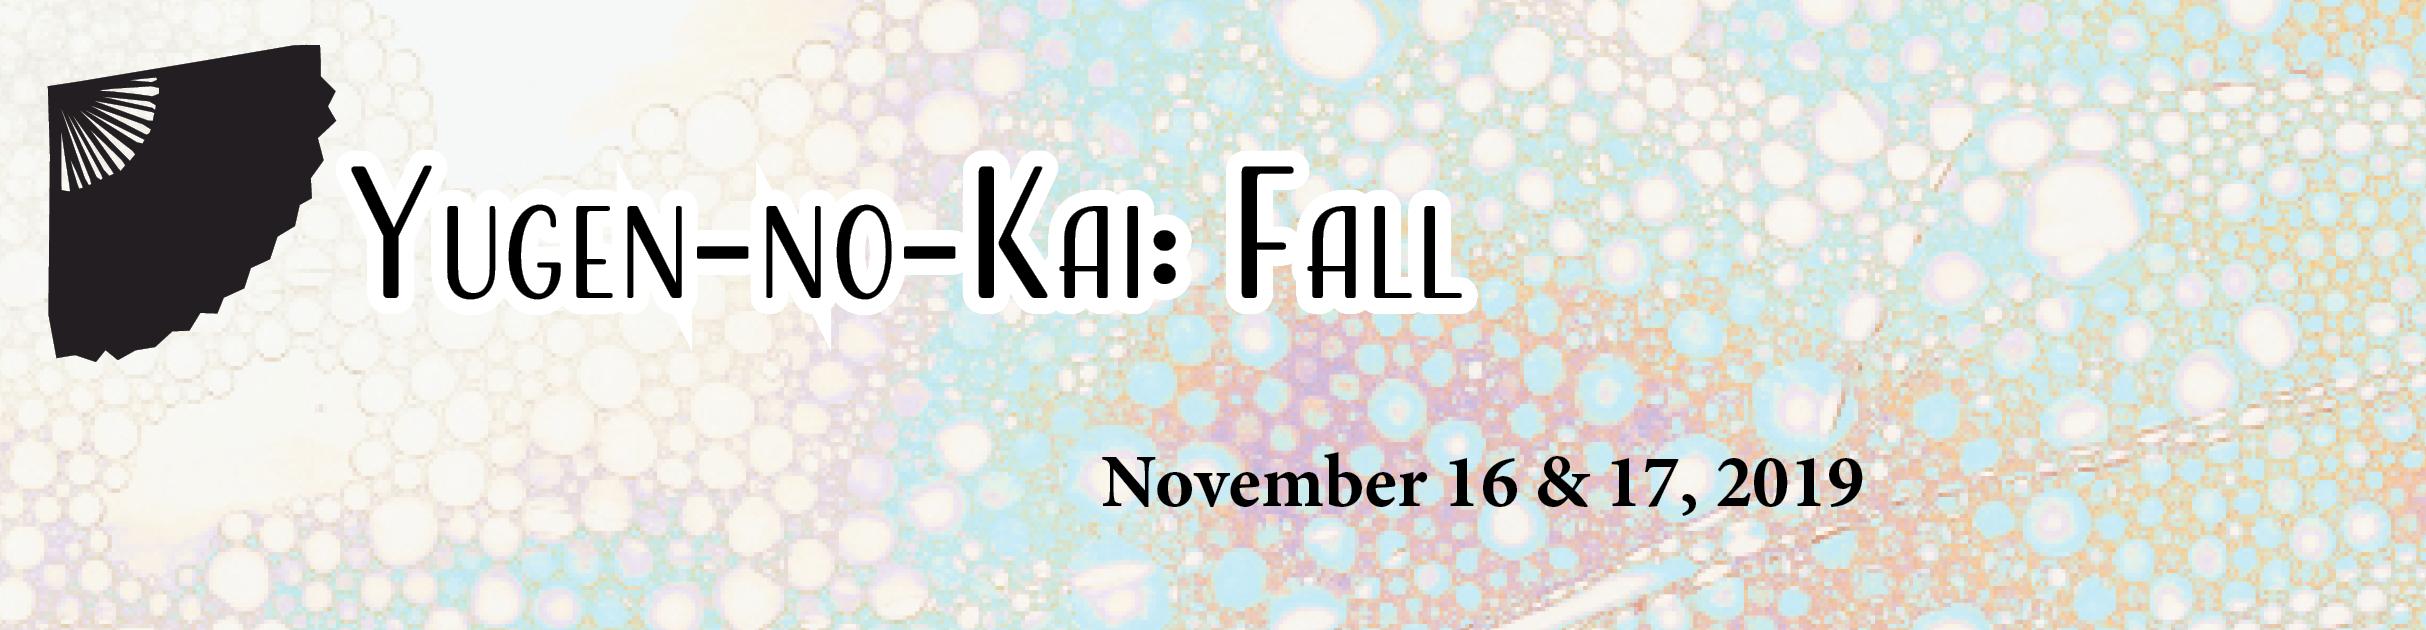 2019 Fall Kyogen banner.png